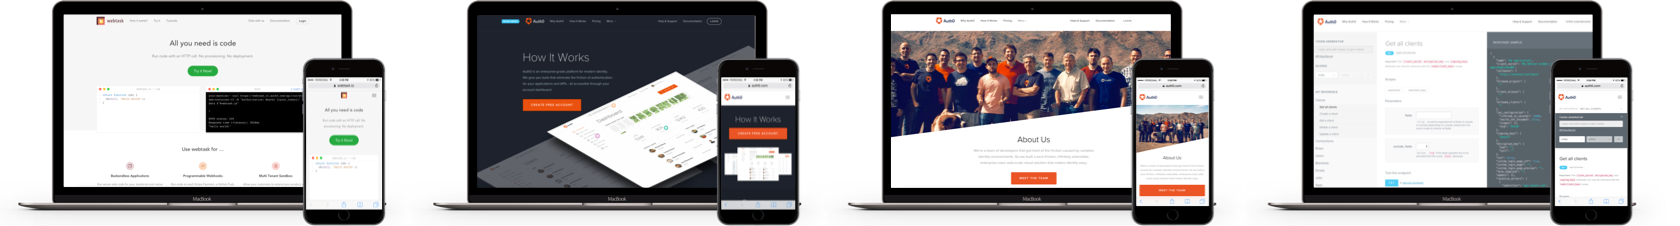 Design process sites